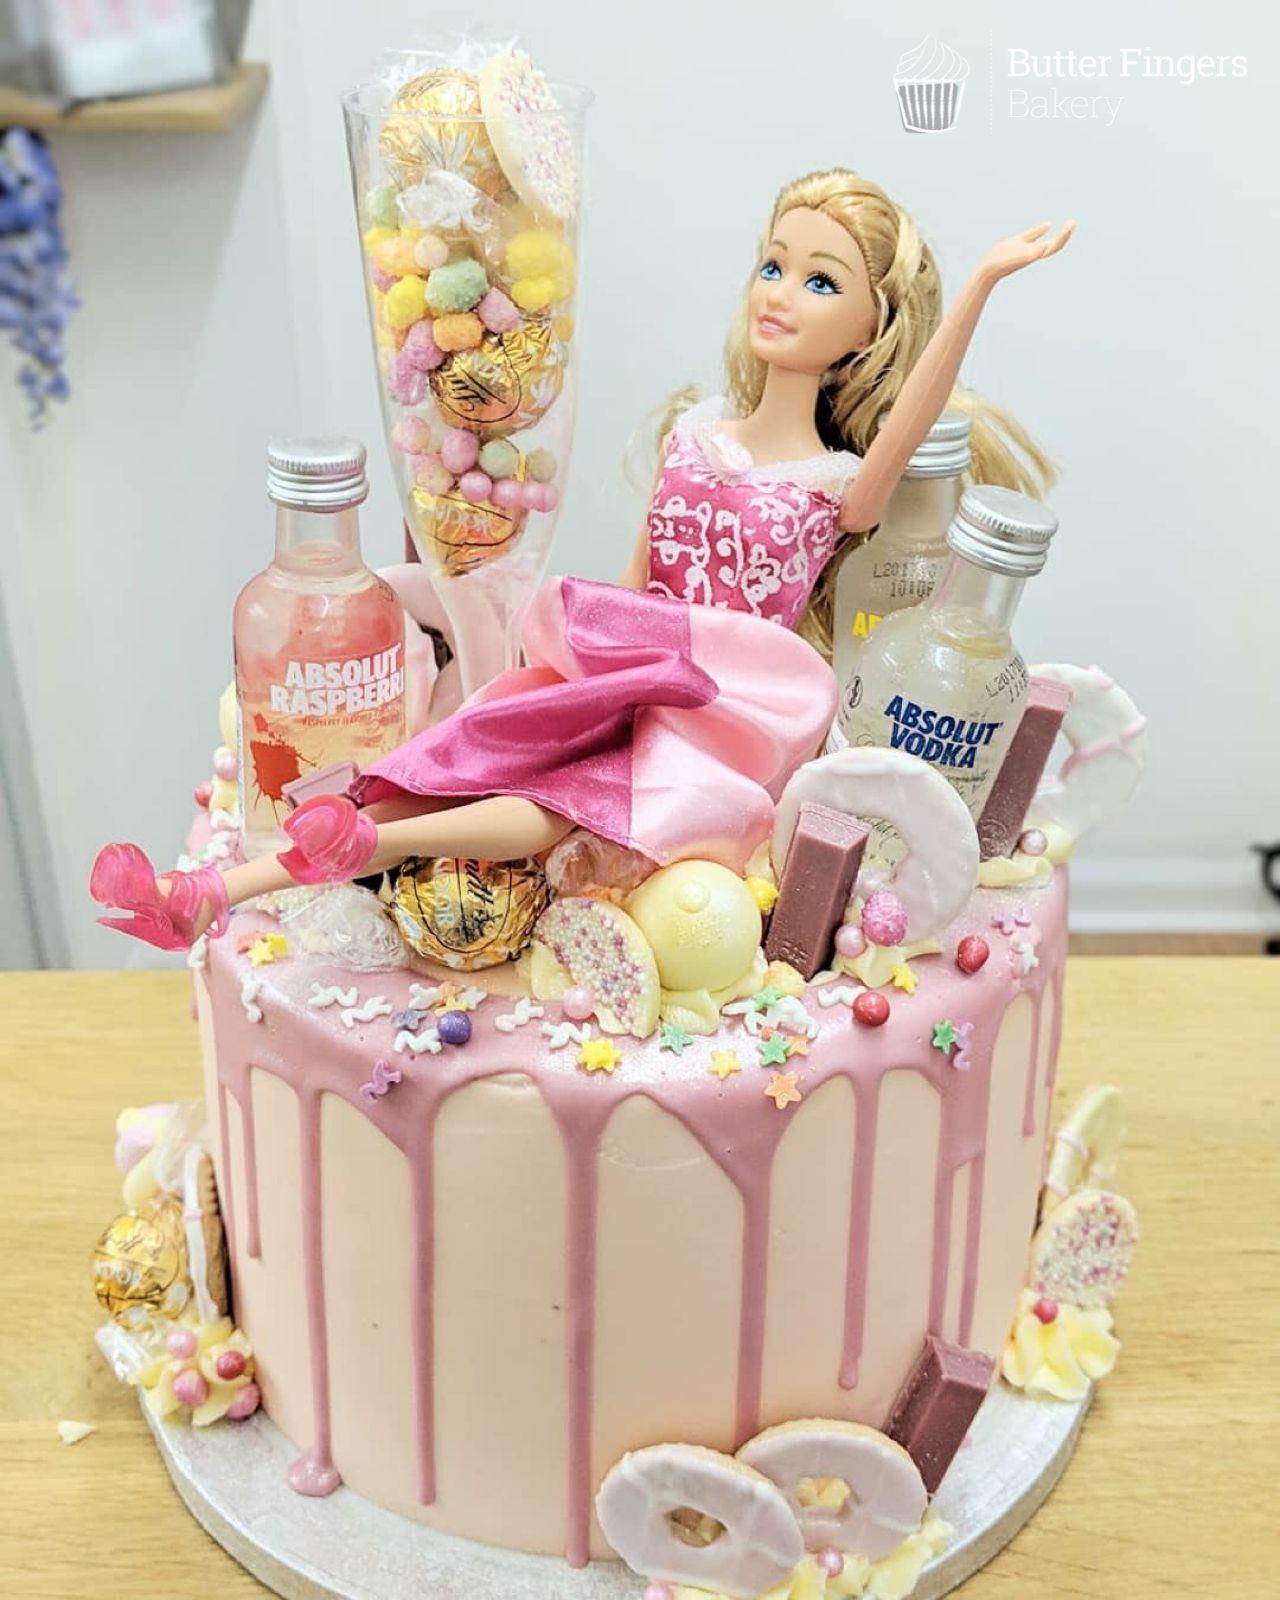 Terrific Tasty Homemade Cakes Baked Freshly In Matlock Girly Birthday Funny Birthday Cards Online Elaedamsfinfo